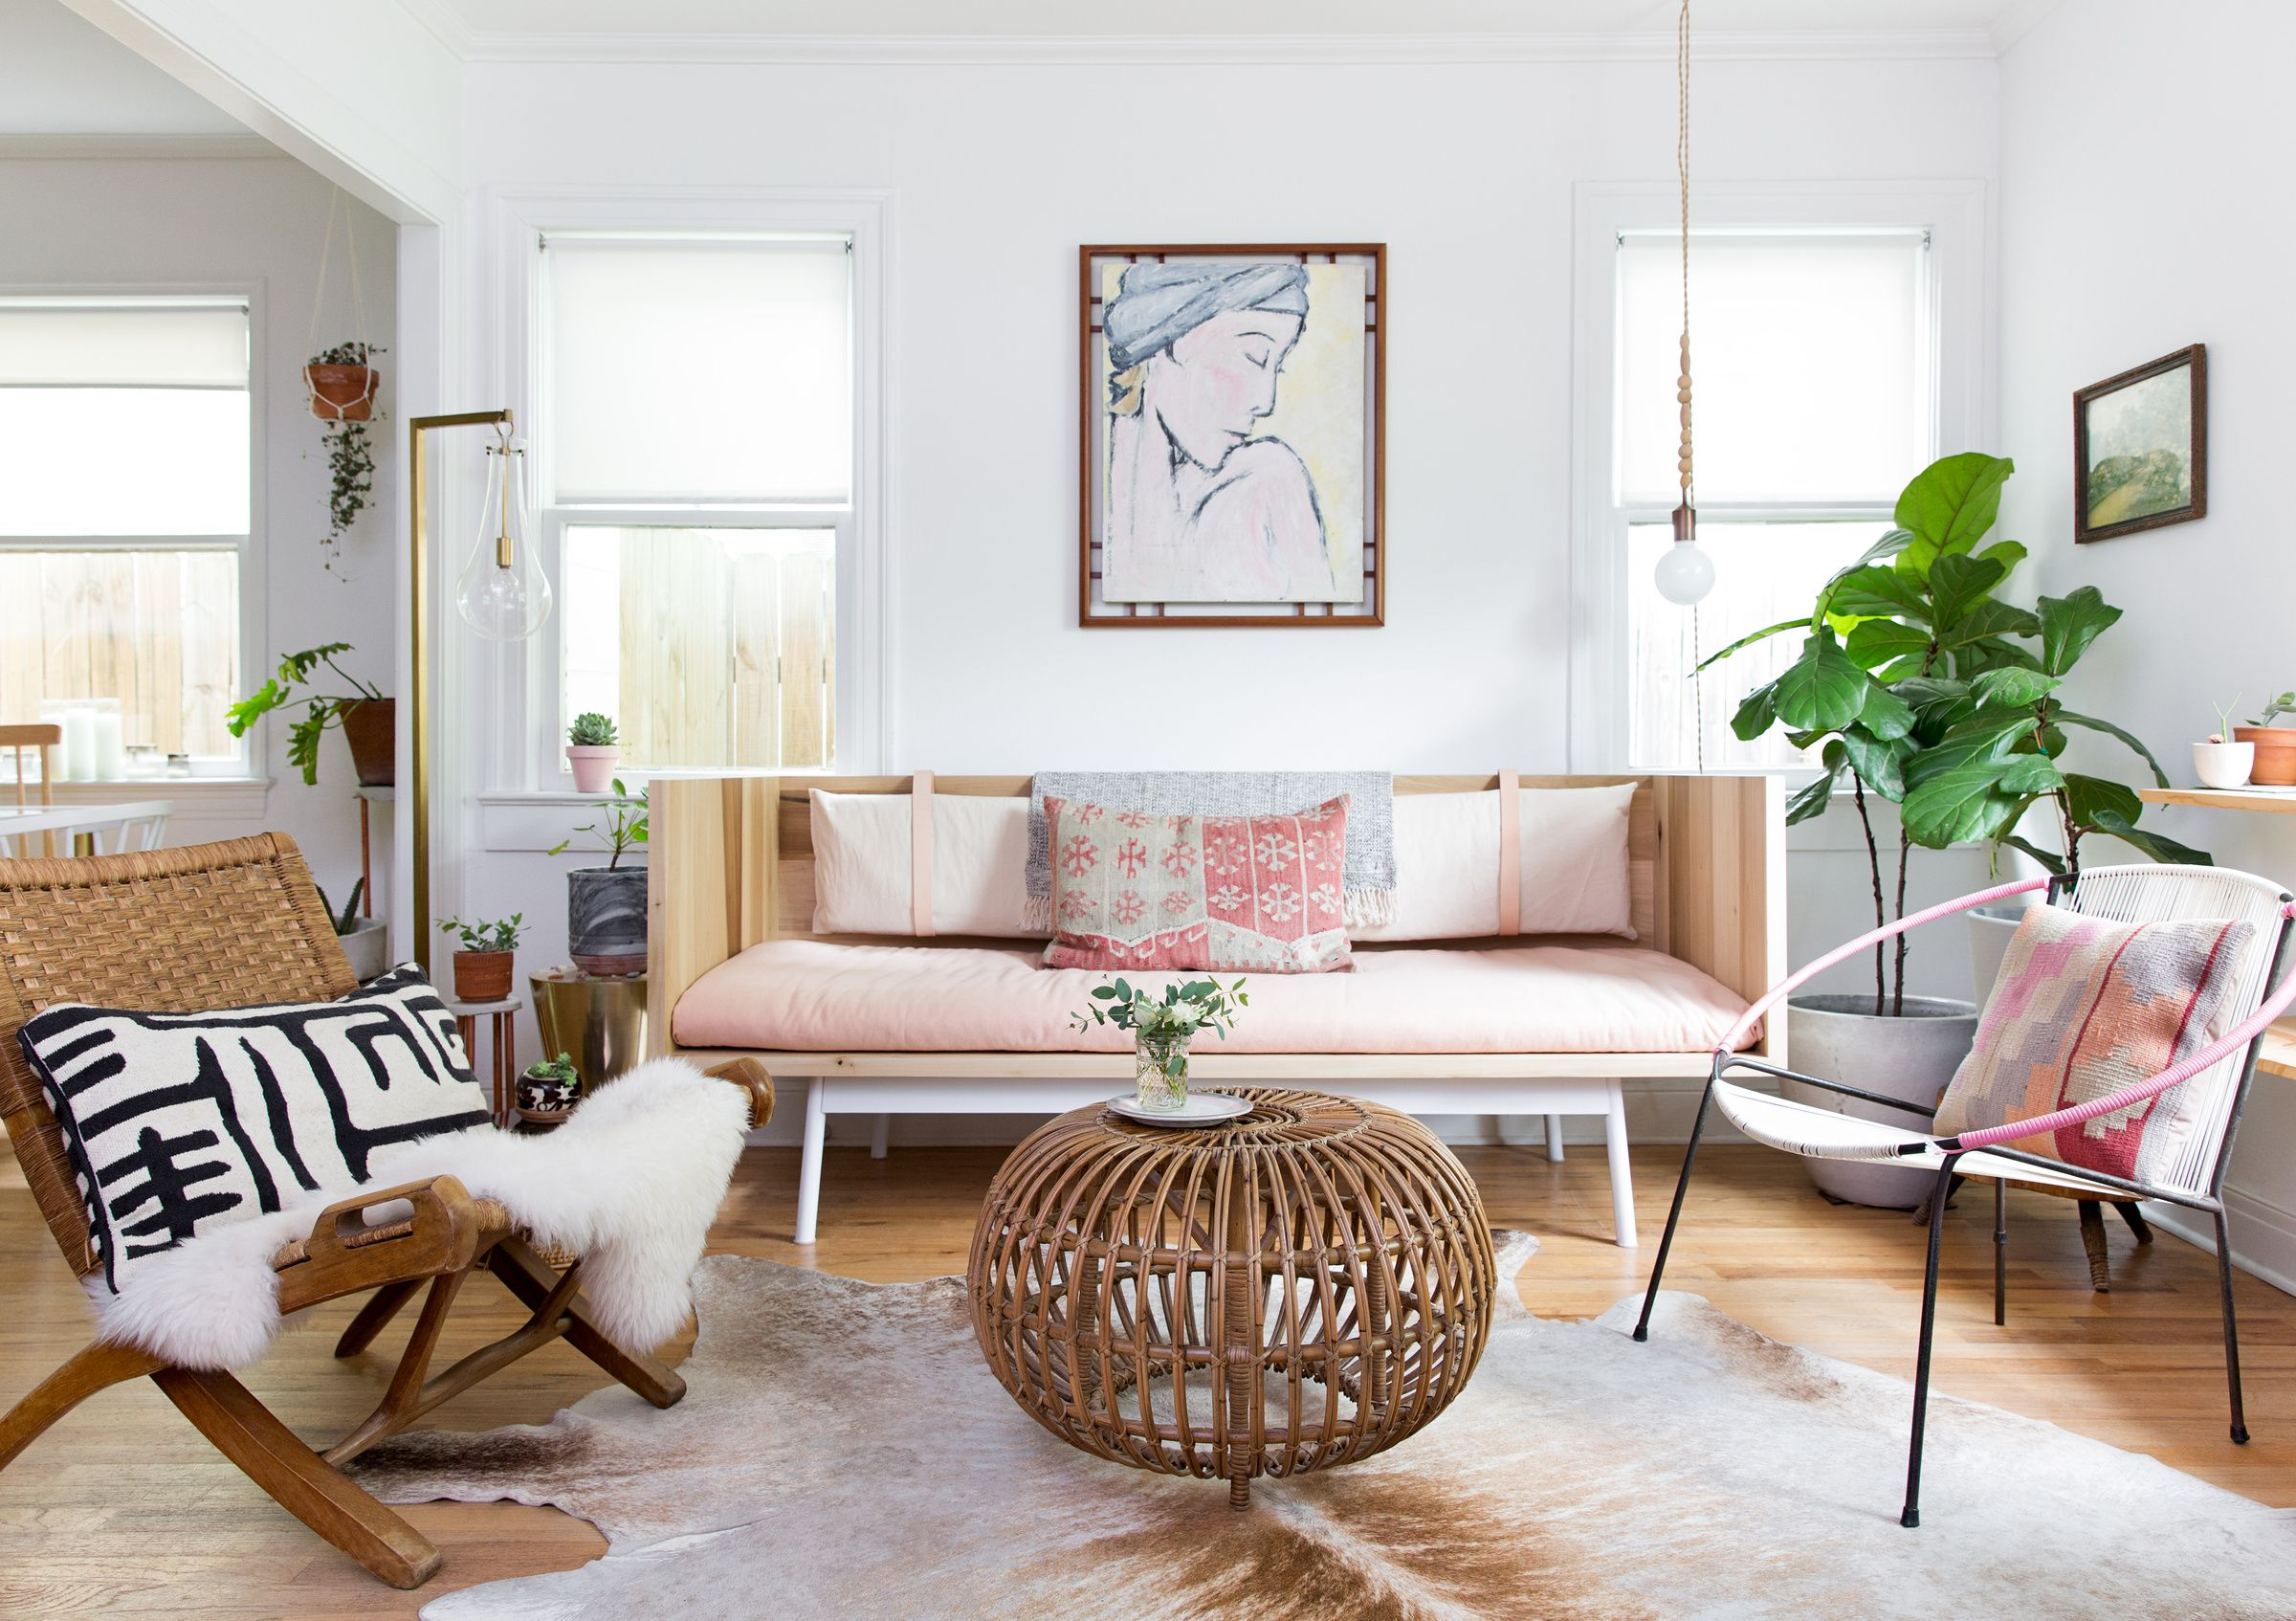 Hyde Park Bungalow Remodel Claire Zinnecker Design Living Room Decor Inspiration Living Room Inspo Living Room White